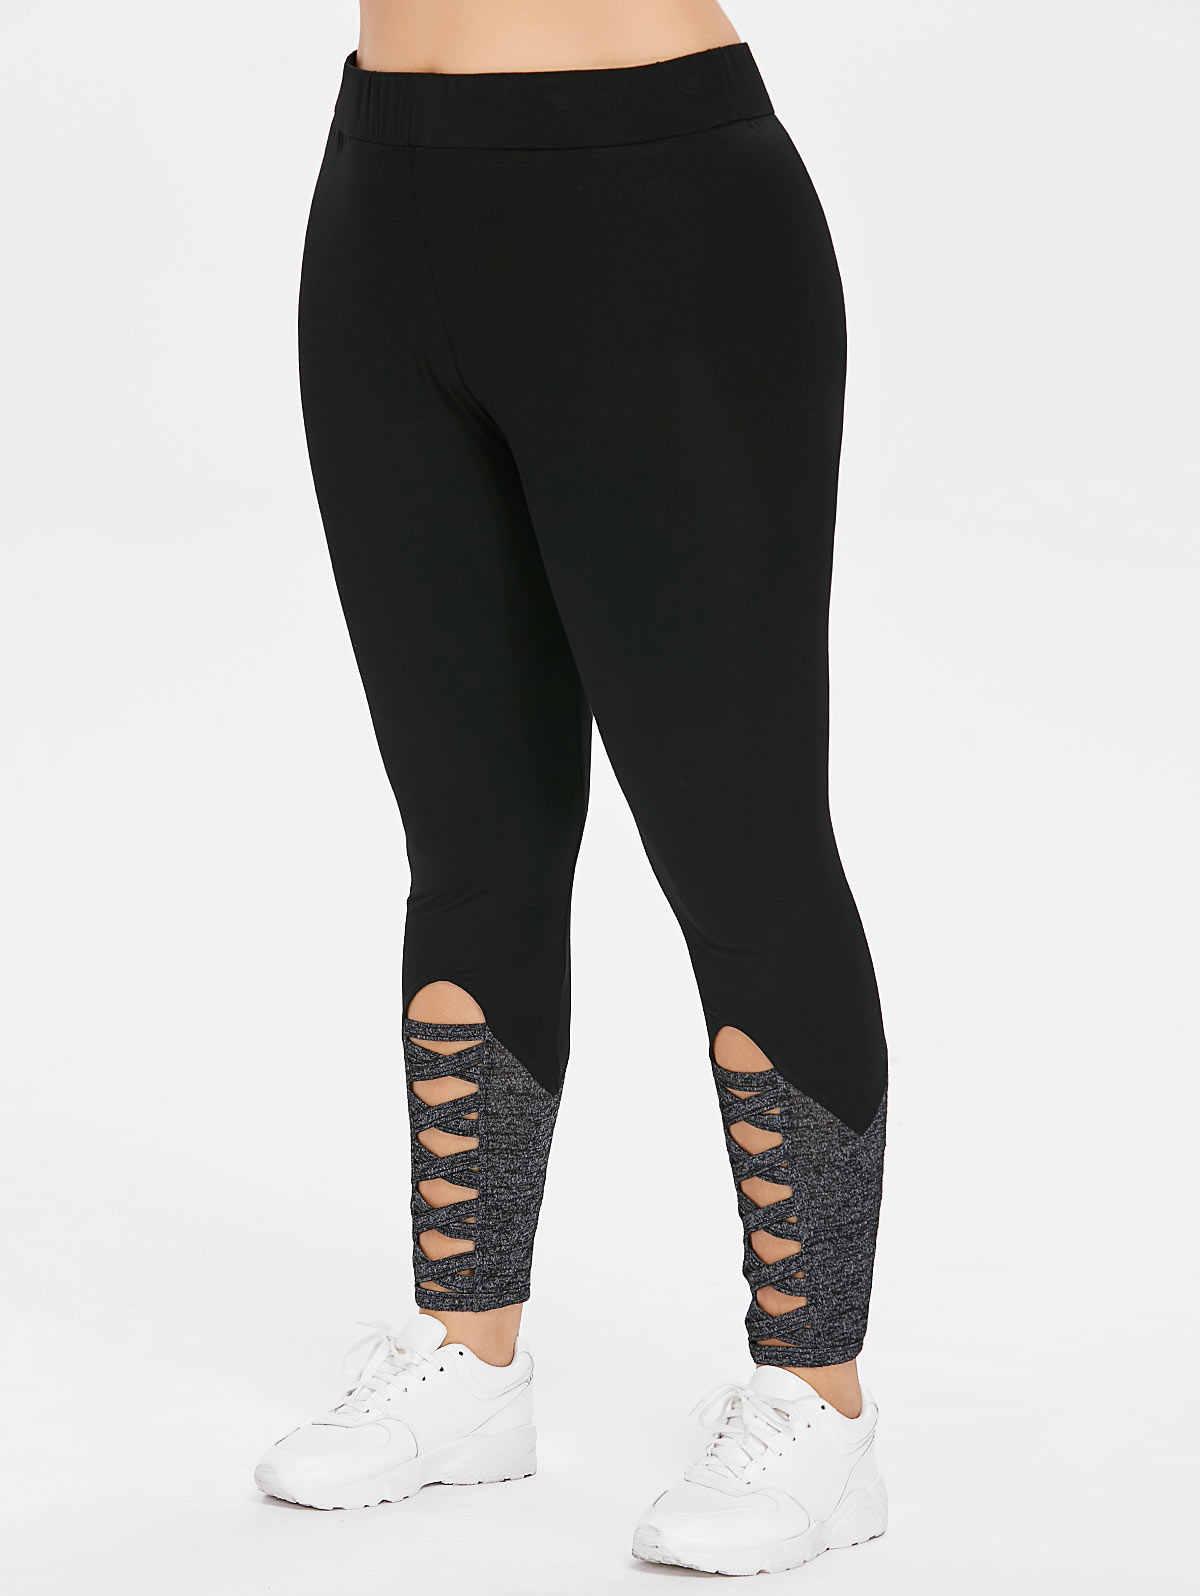 dffc4718c9 ... New Fashion Plus Size Ladder Cutout Capri Leggings Sexy Fitness Legging  Women Workout Leggings Push Up ...